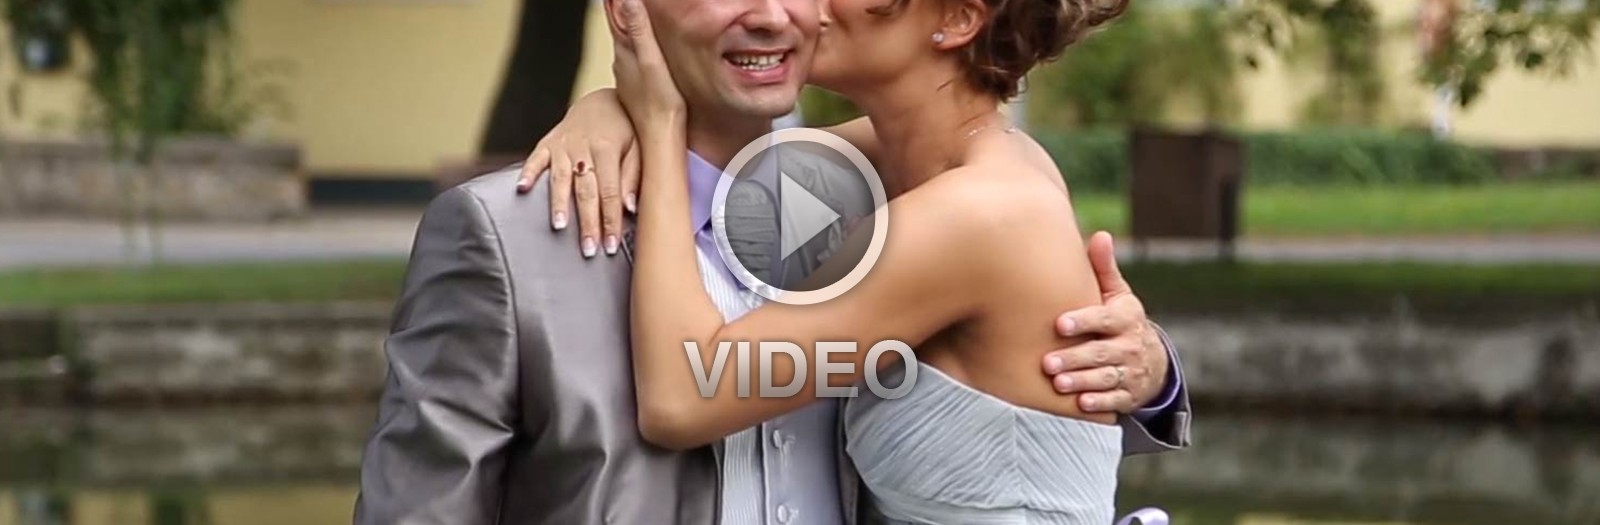 Lucie a Tomáš - 22.8.2014 - video